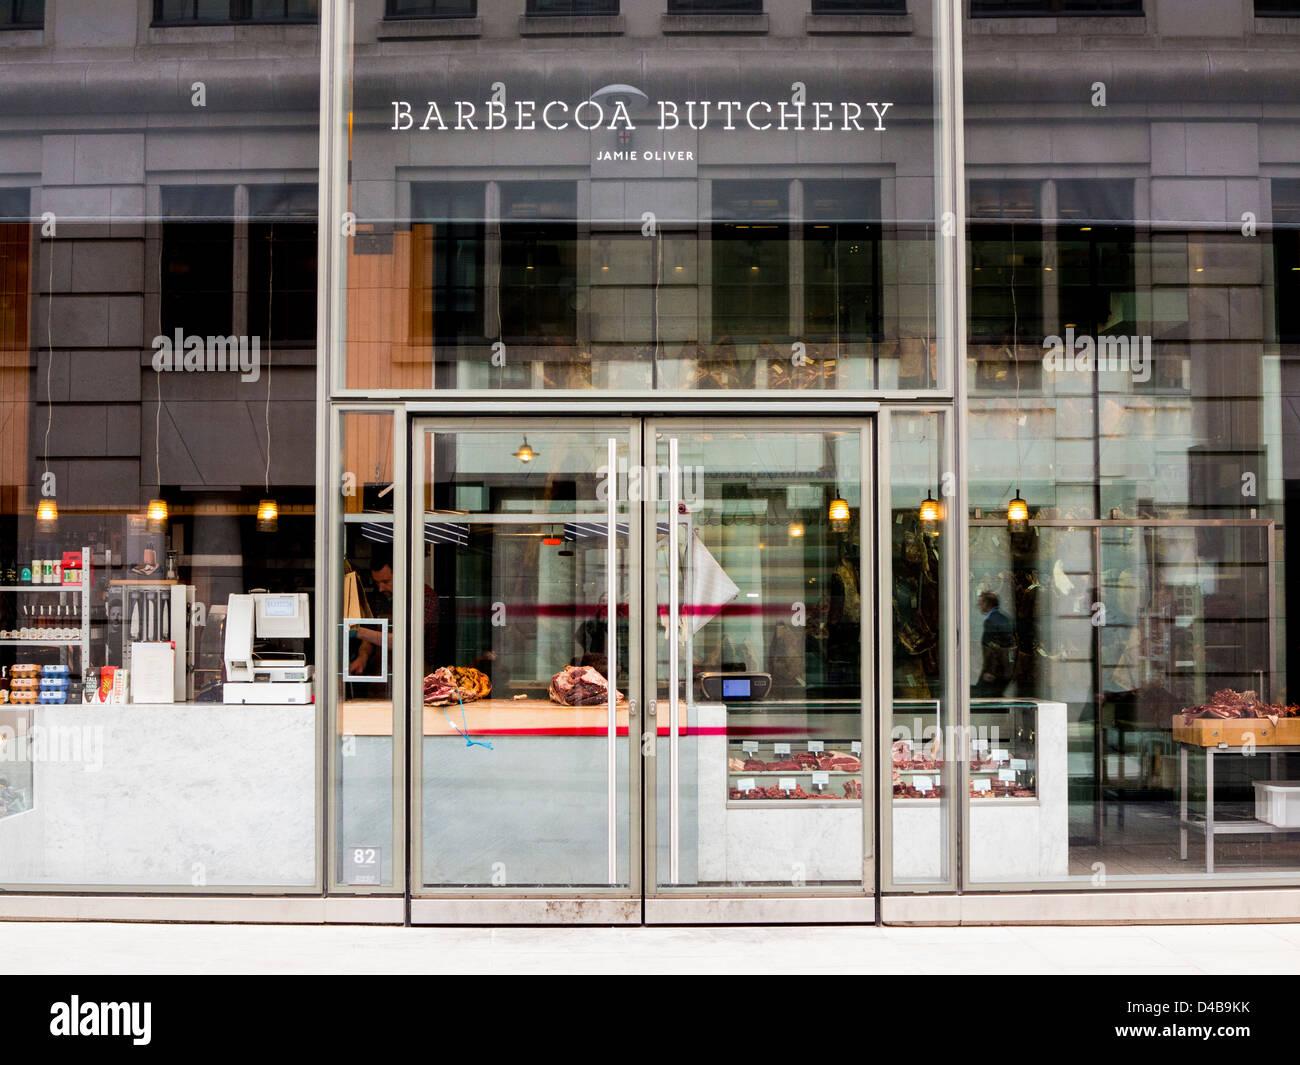 Jamie Oliver's Barbecoa Butchery in London, England - Stock Image